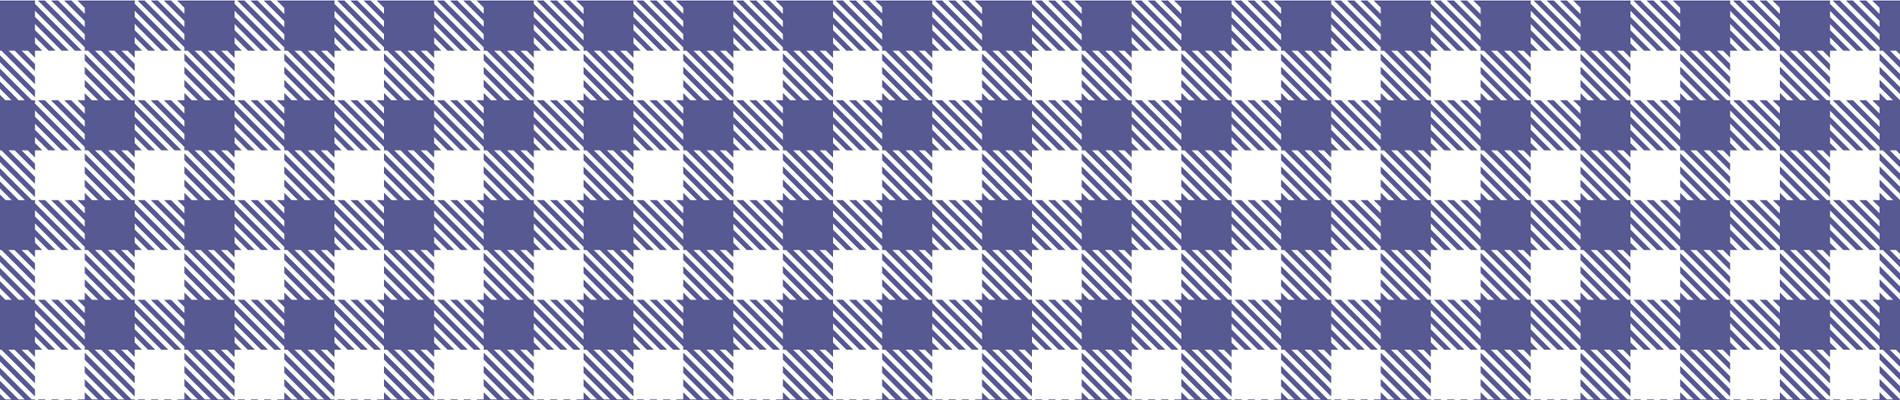 Vichy Blue